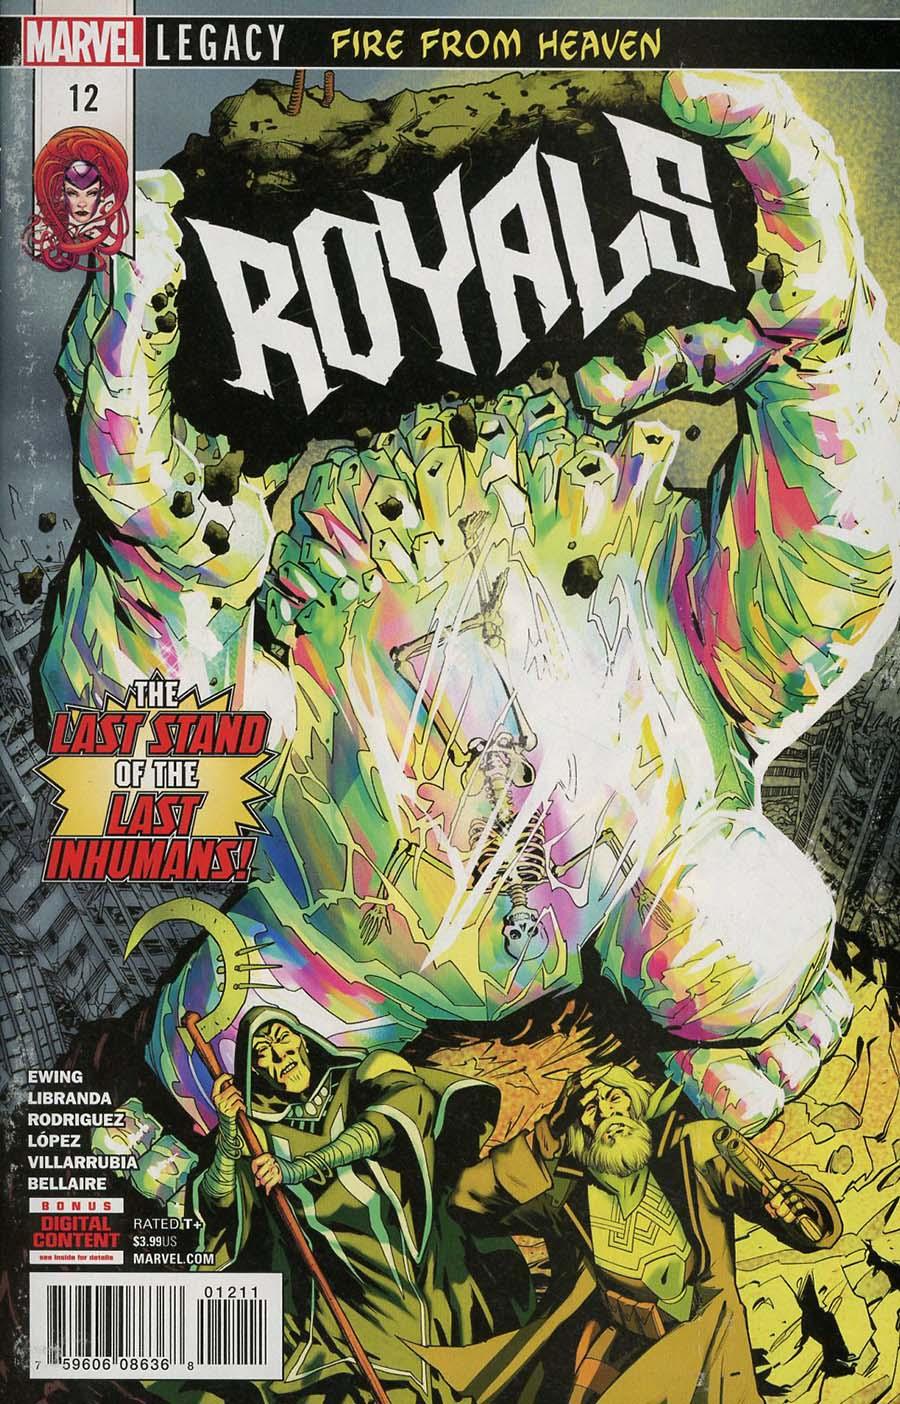 Royals #12 (Marvel Legacy Tie-In)